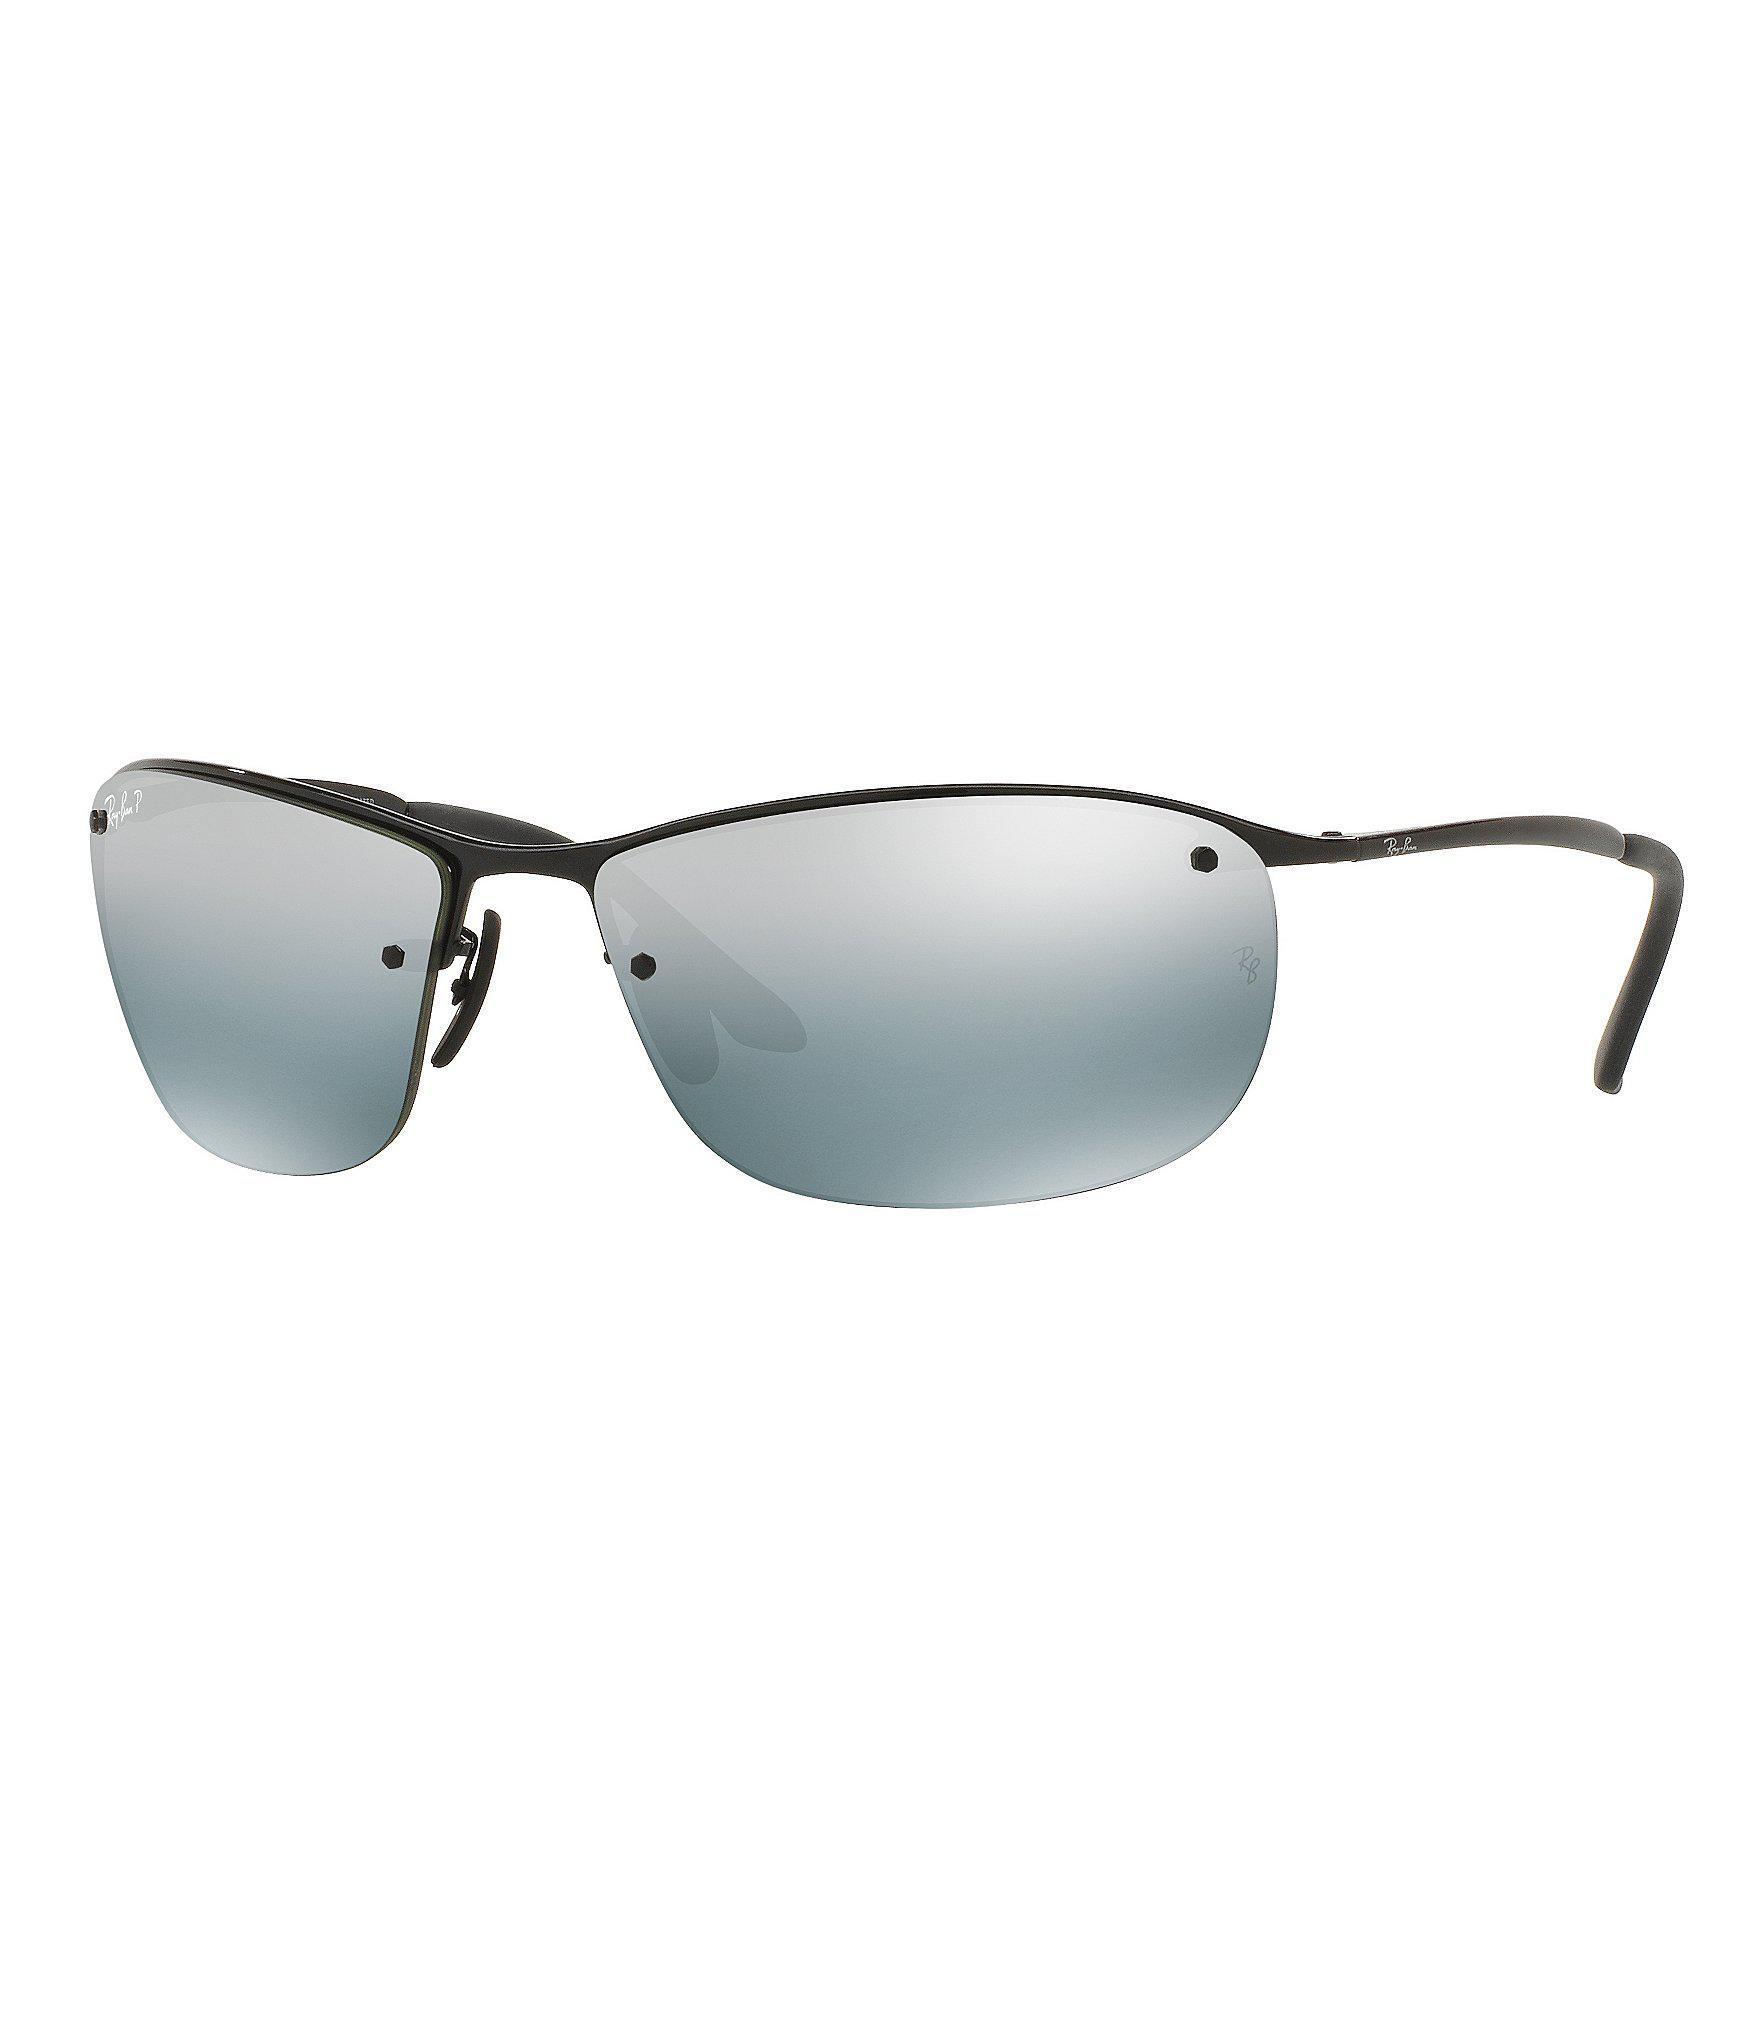 b201ea6226 Lyst - Ray-Ban Chromance Flash mirror Wrap Sunglasses in Black for Men